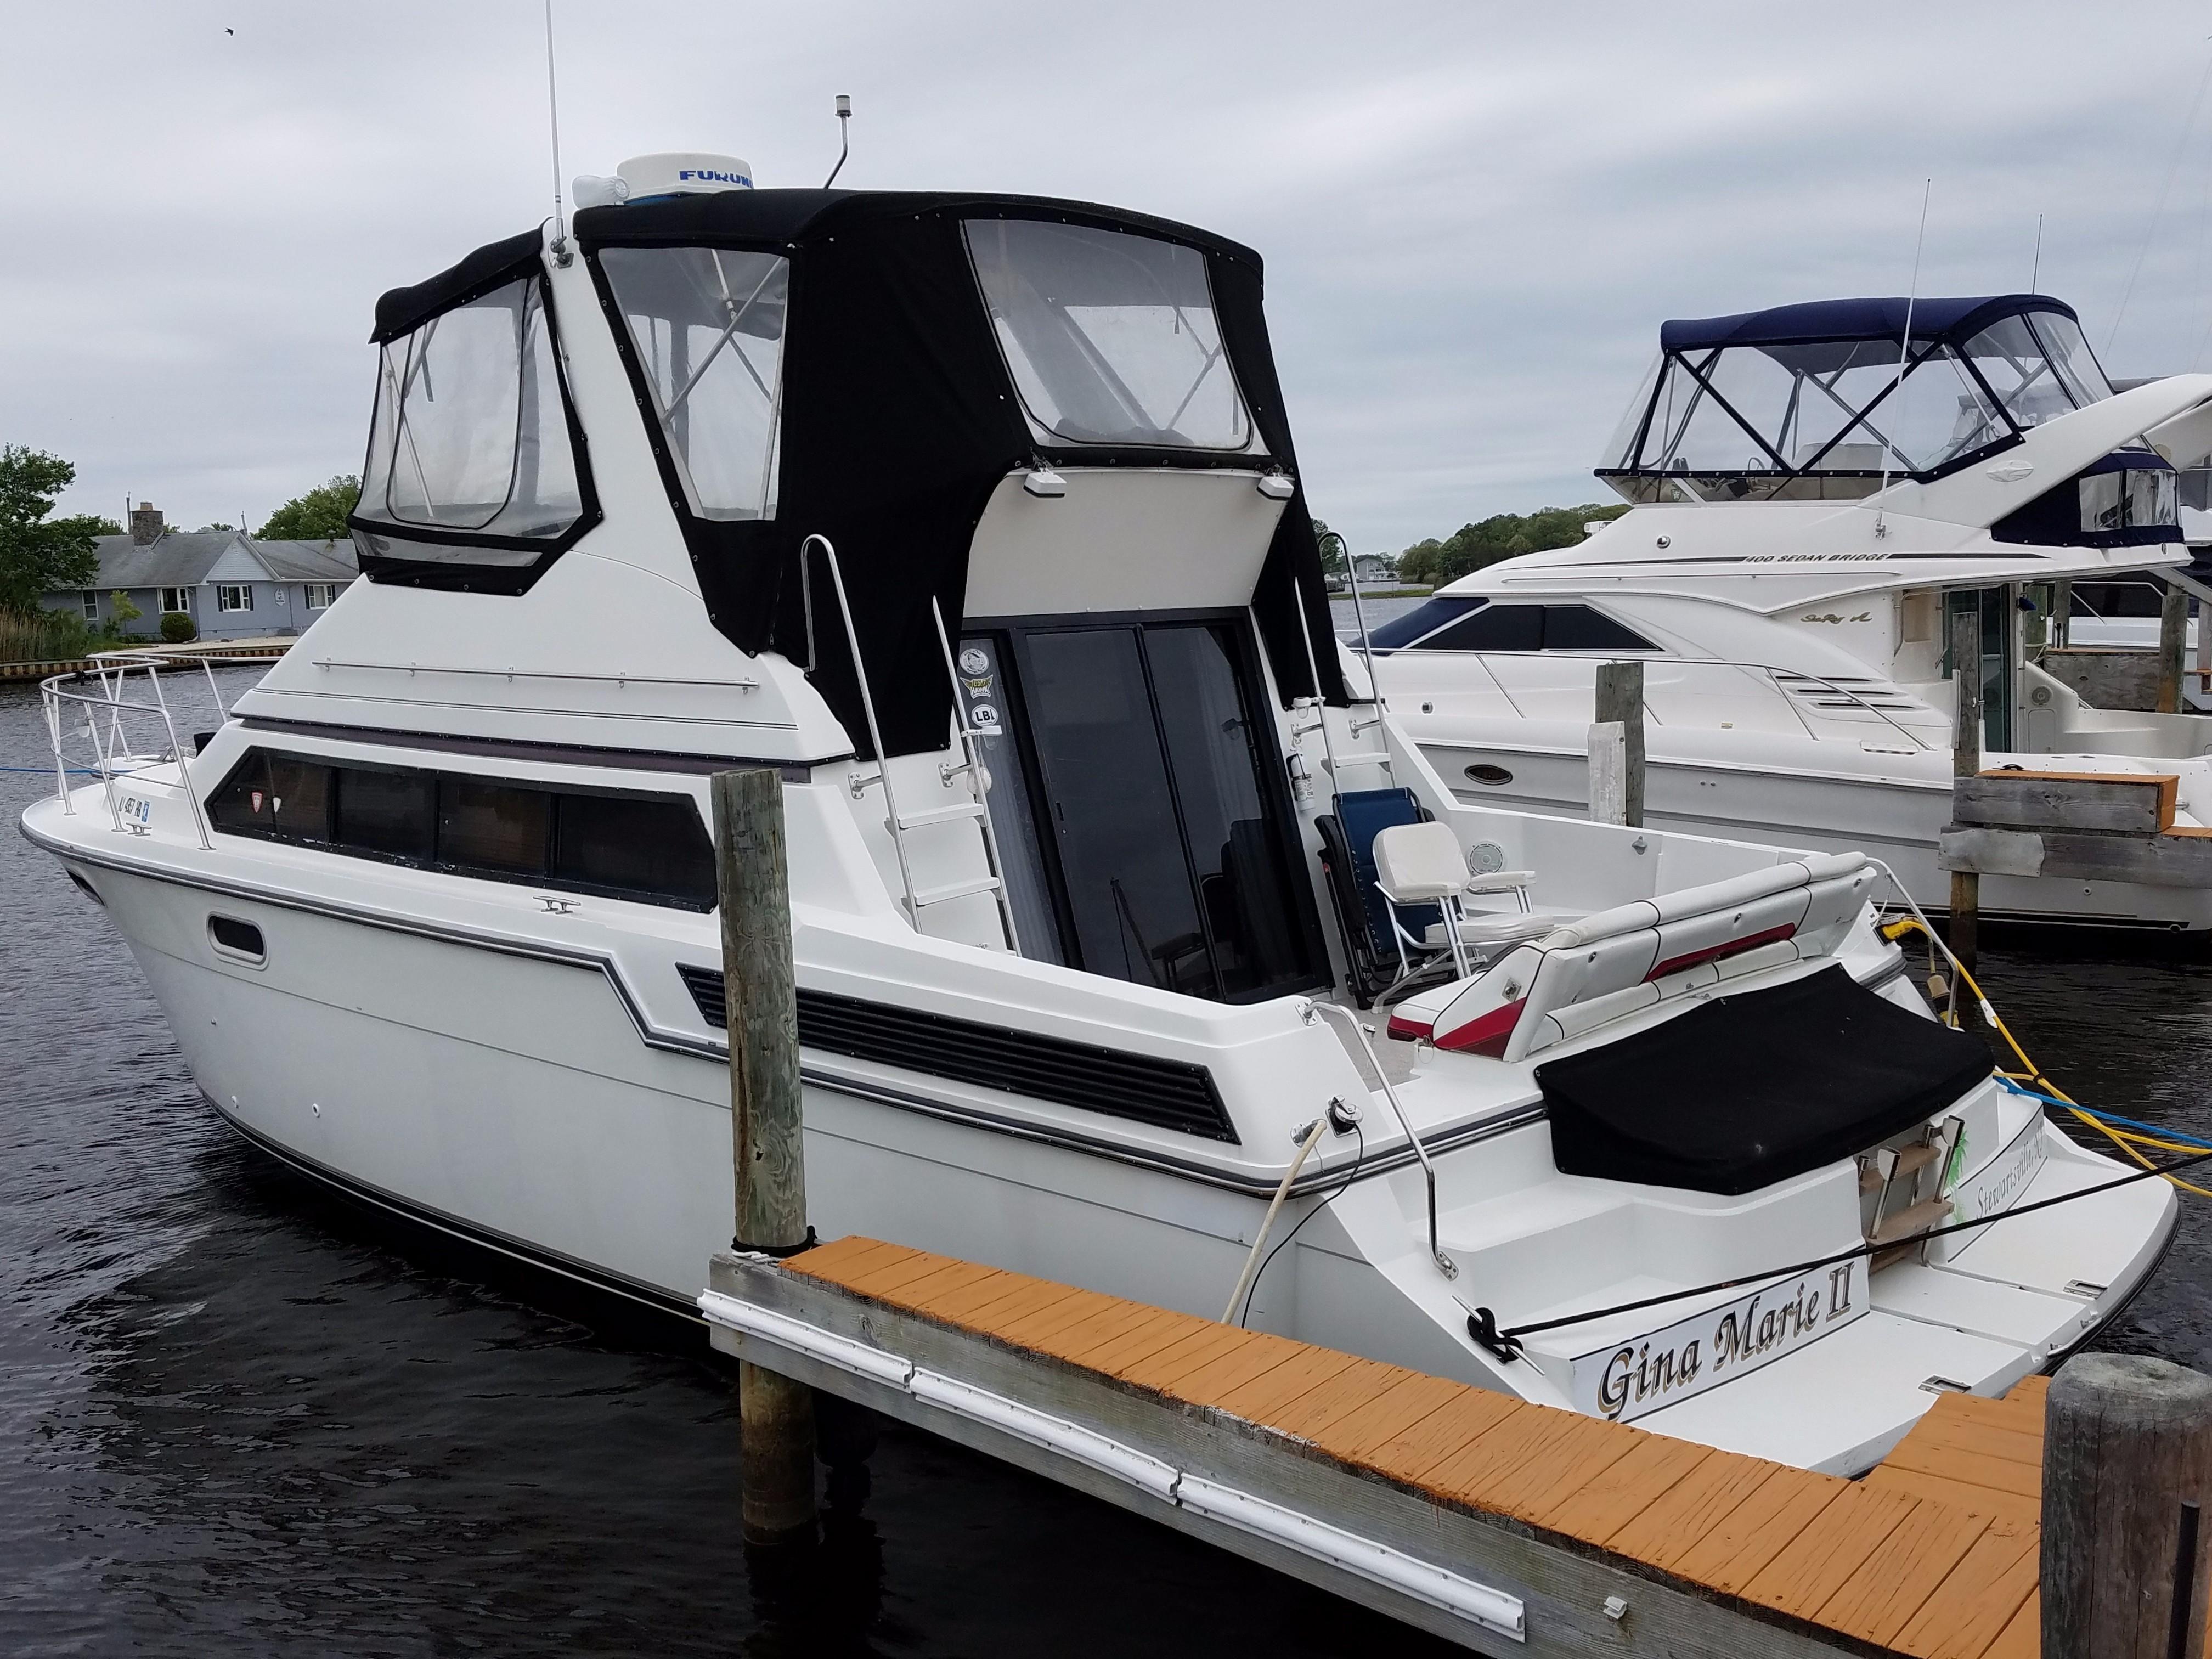 1989 Carver 3867 Santego Power Boat For Sale Www